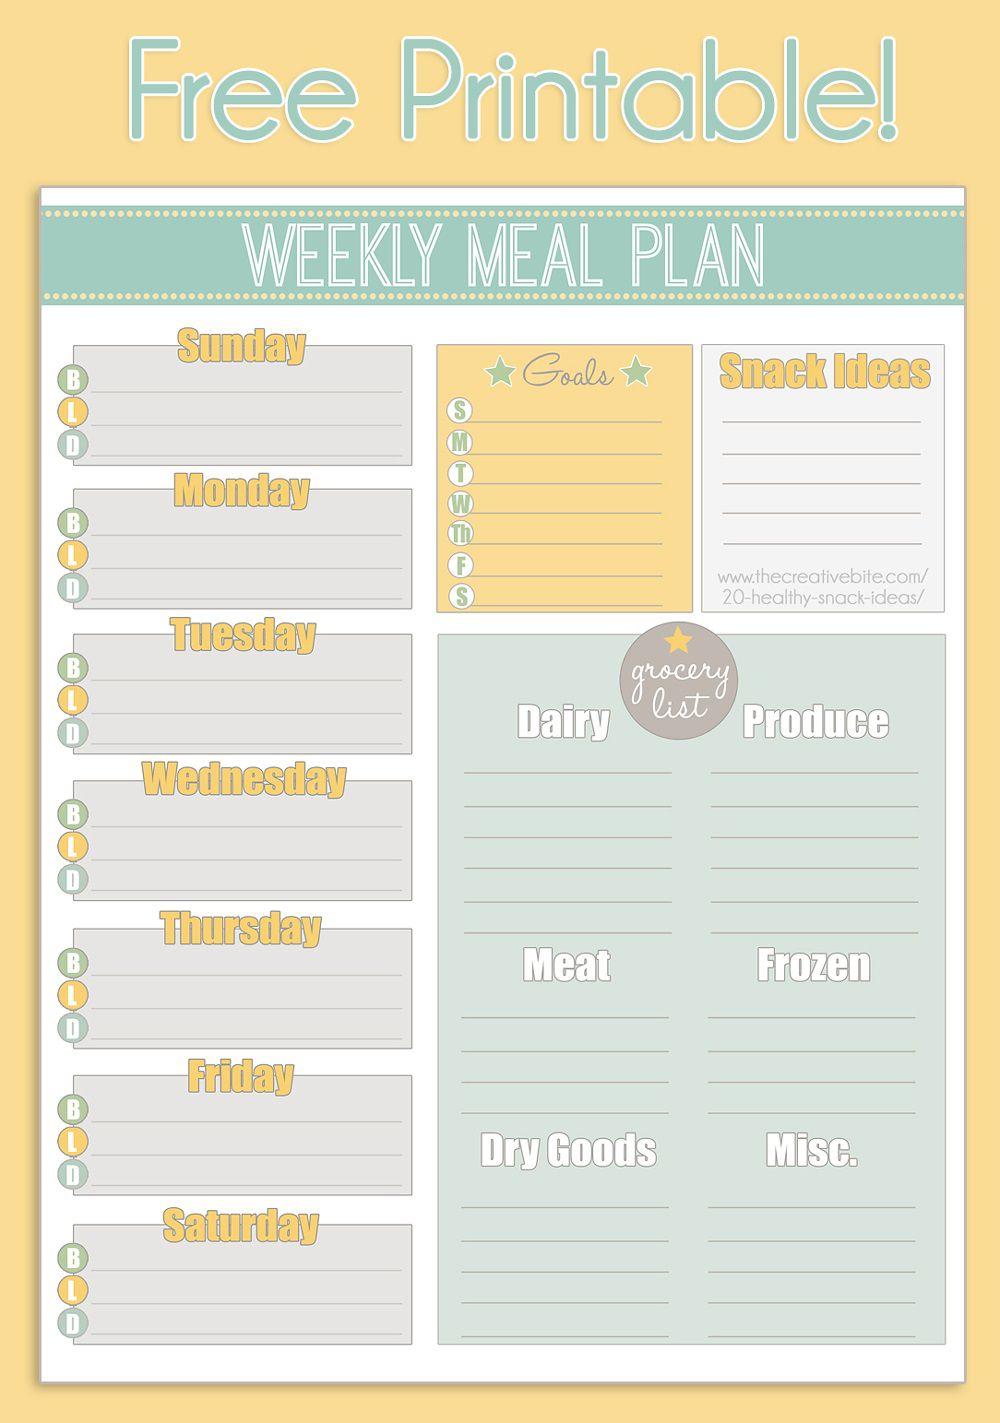 002 Fascinating Free Printable Weekly Meal Plan Template Example  Planning WorksheetFull